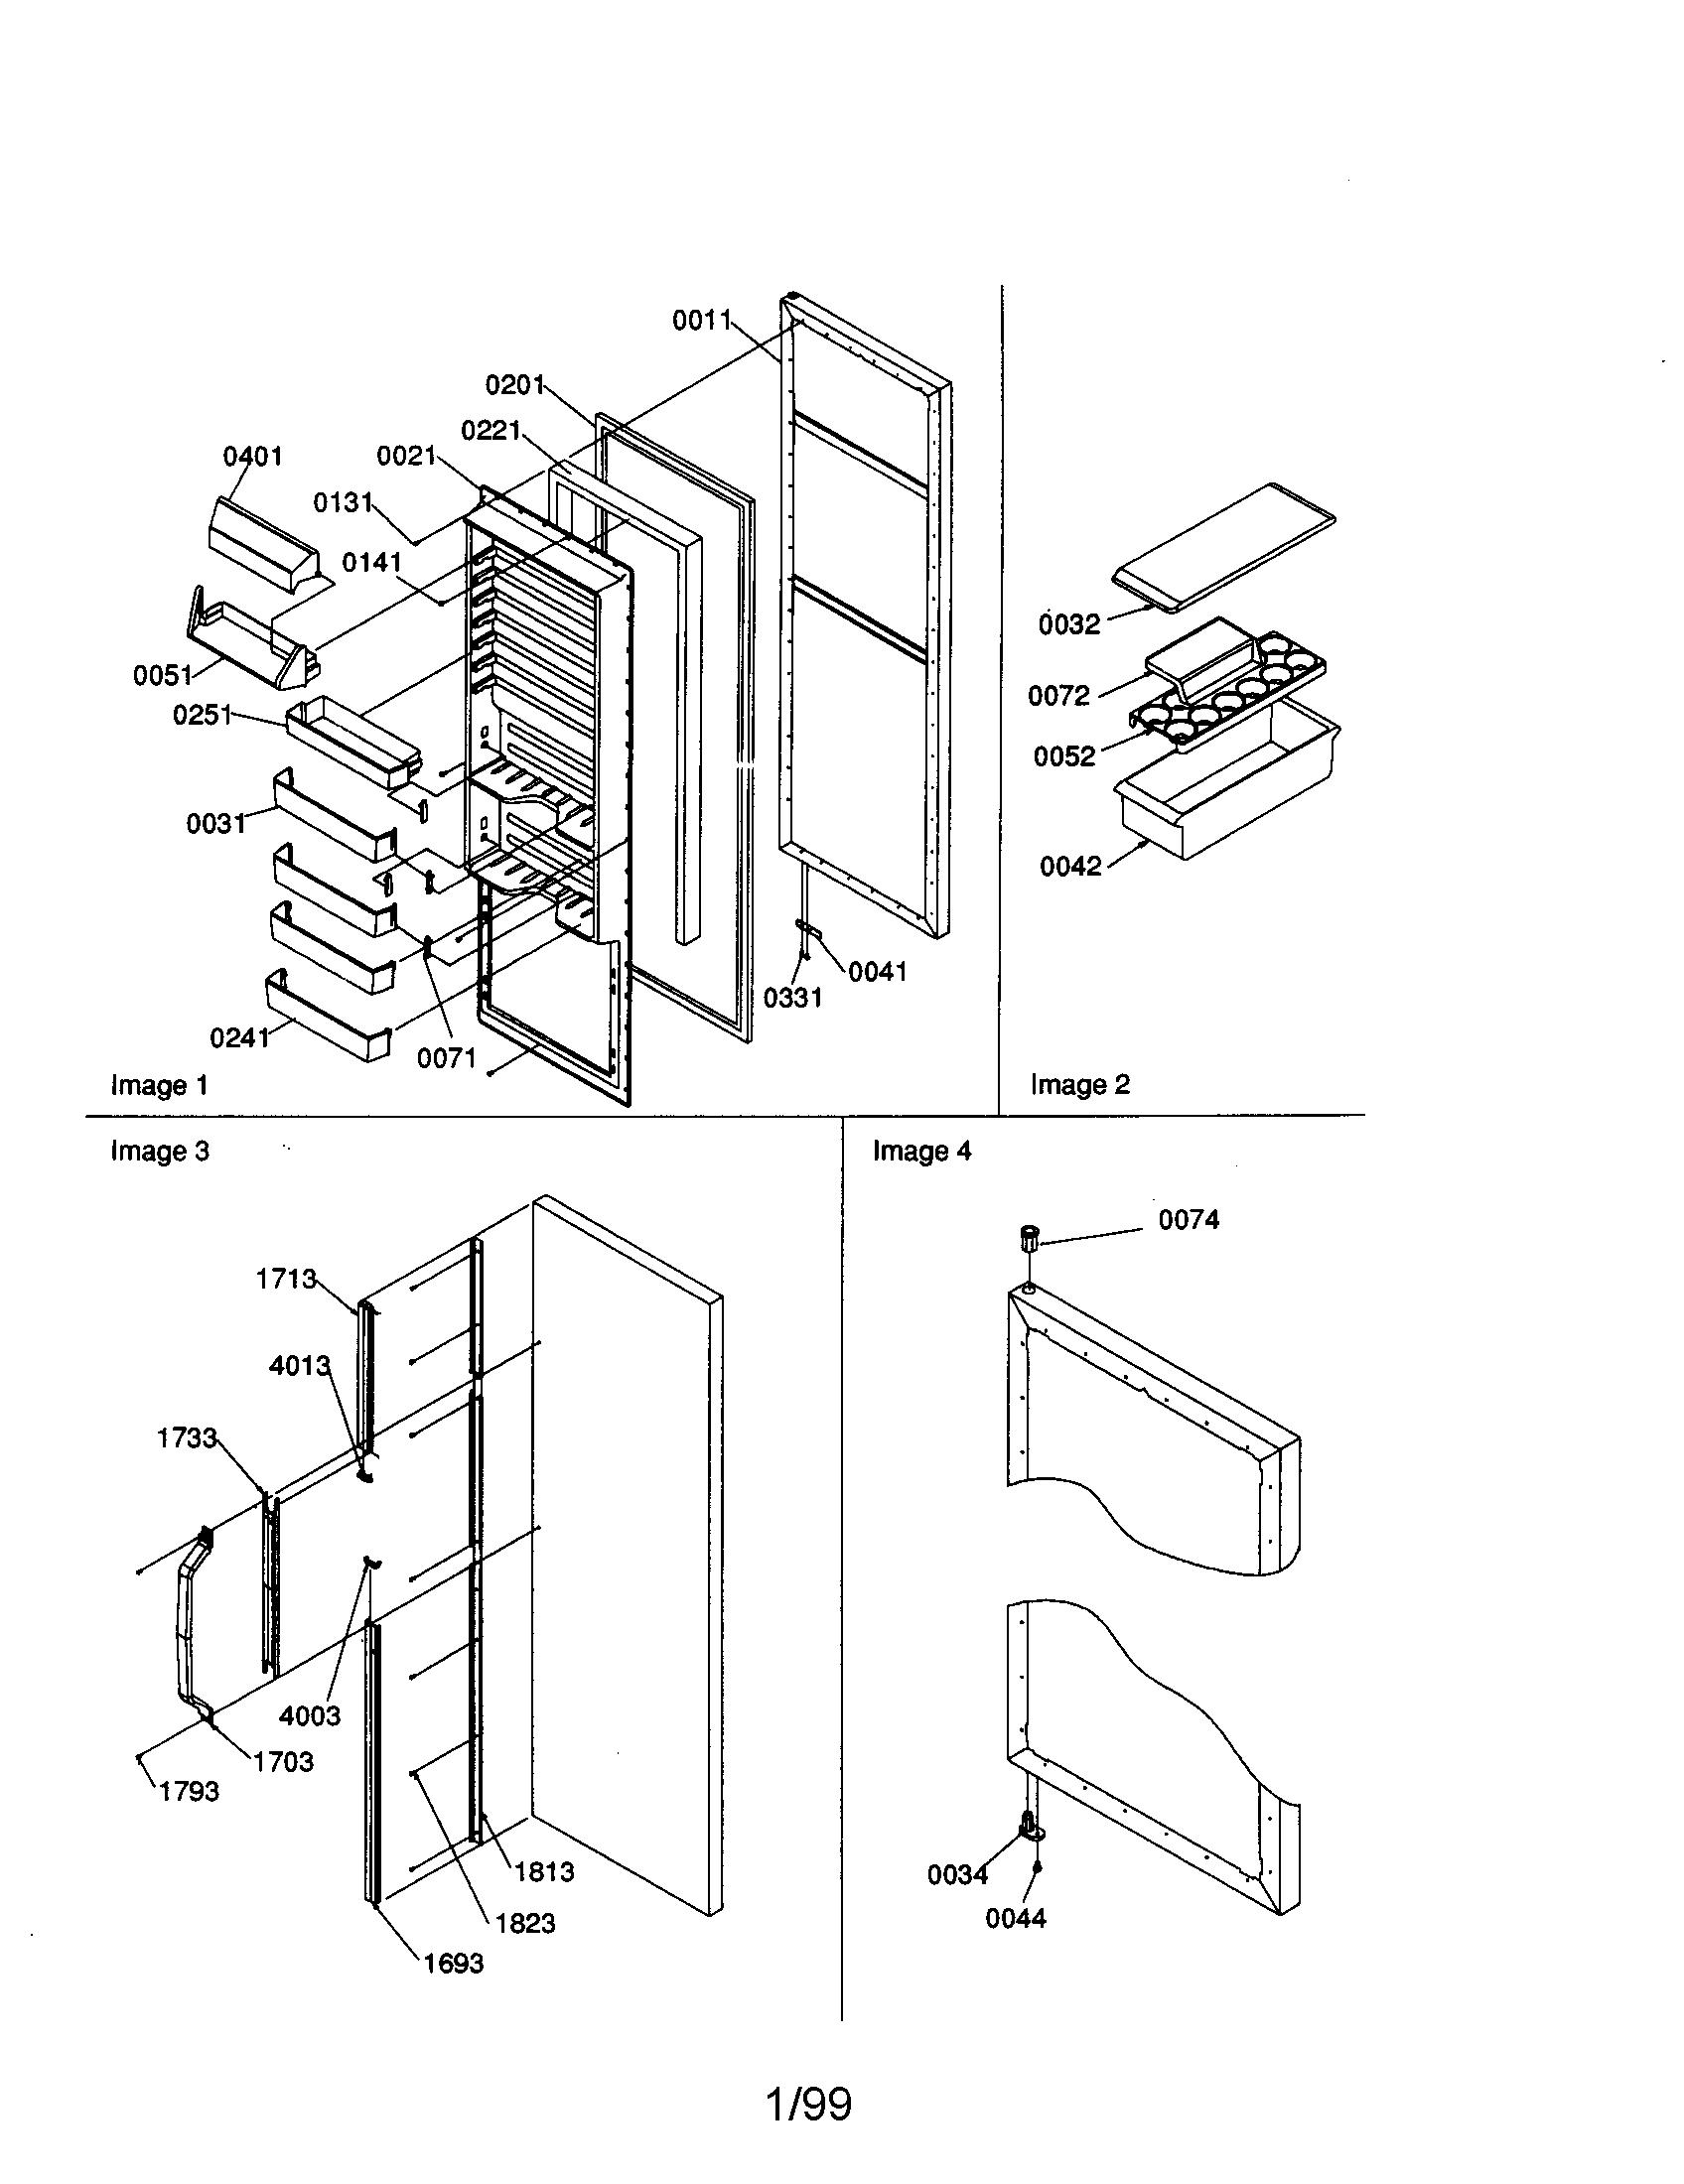 hight resolution of amana sxd22s2w wiring diagram wiring library rh 90 codingcommunity de amana ac wiring diagram amana dryer